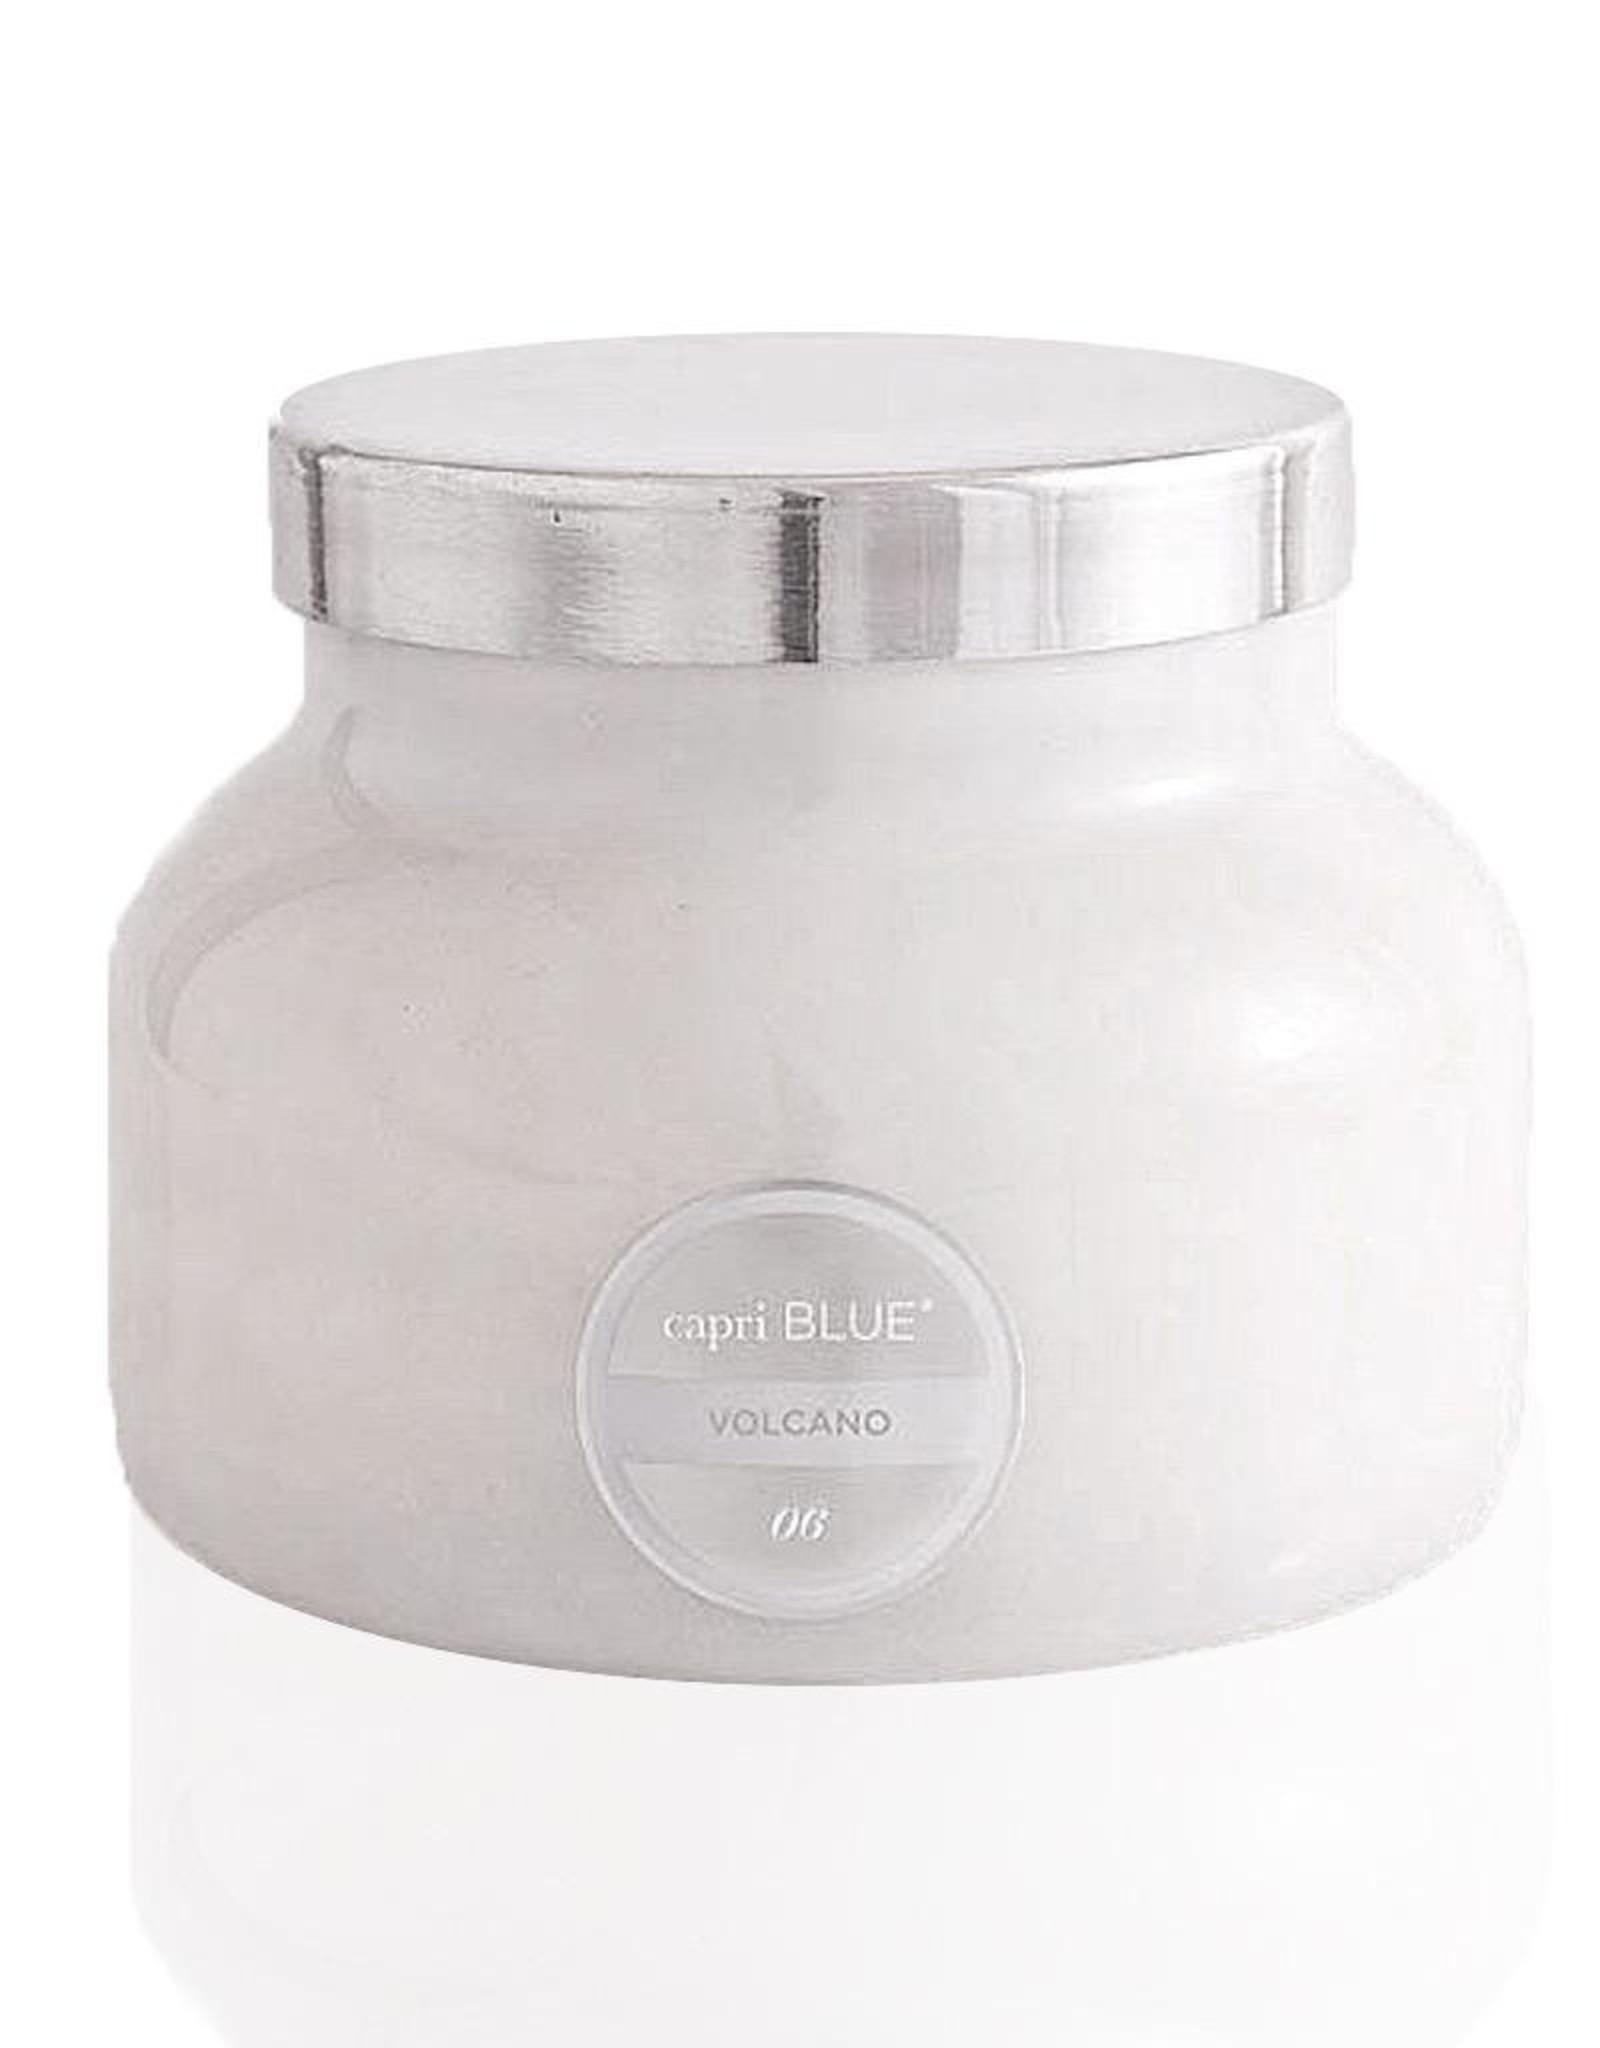 capri BLUE Volcano Candle White Signature Jar 19 Oz